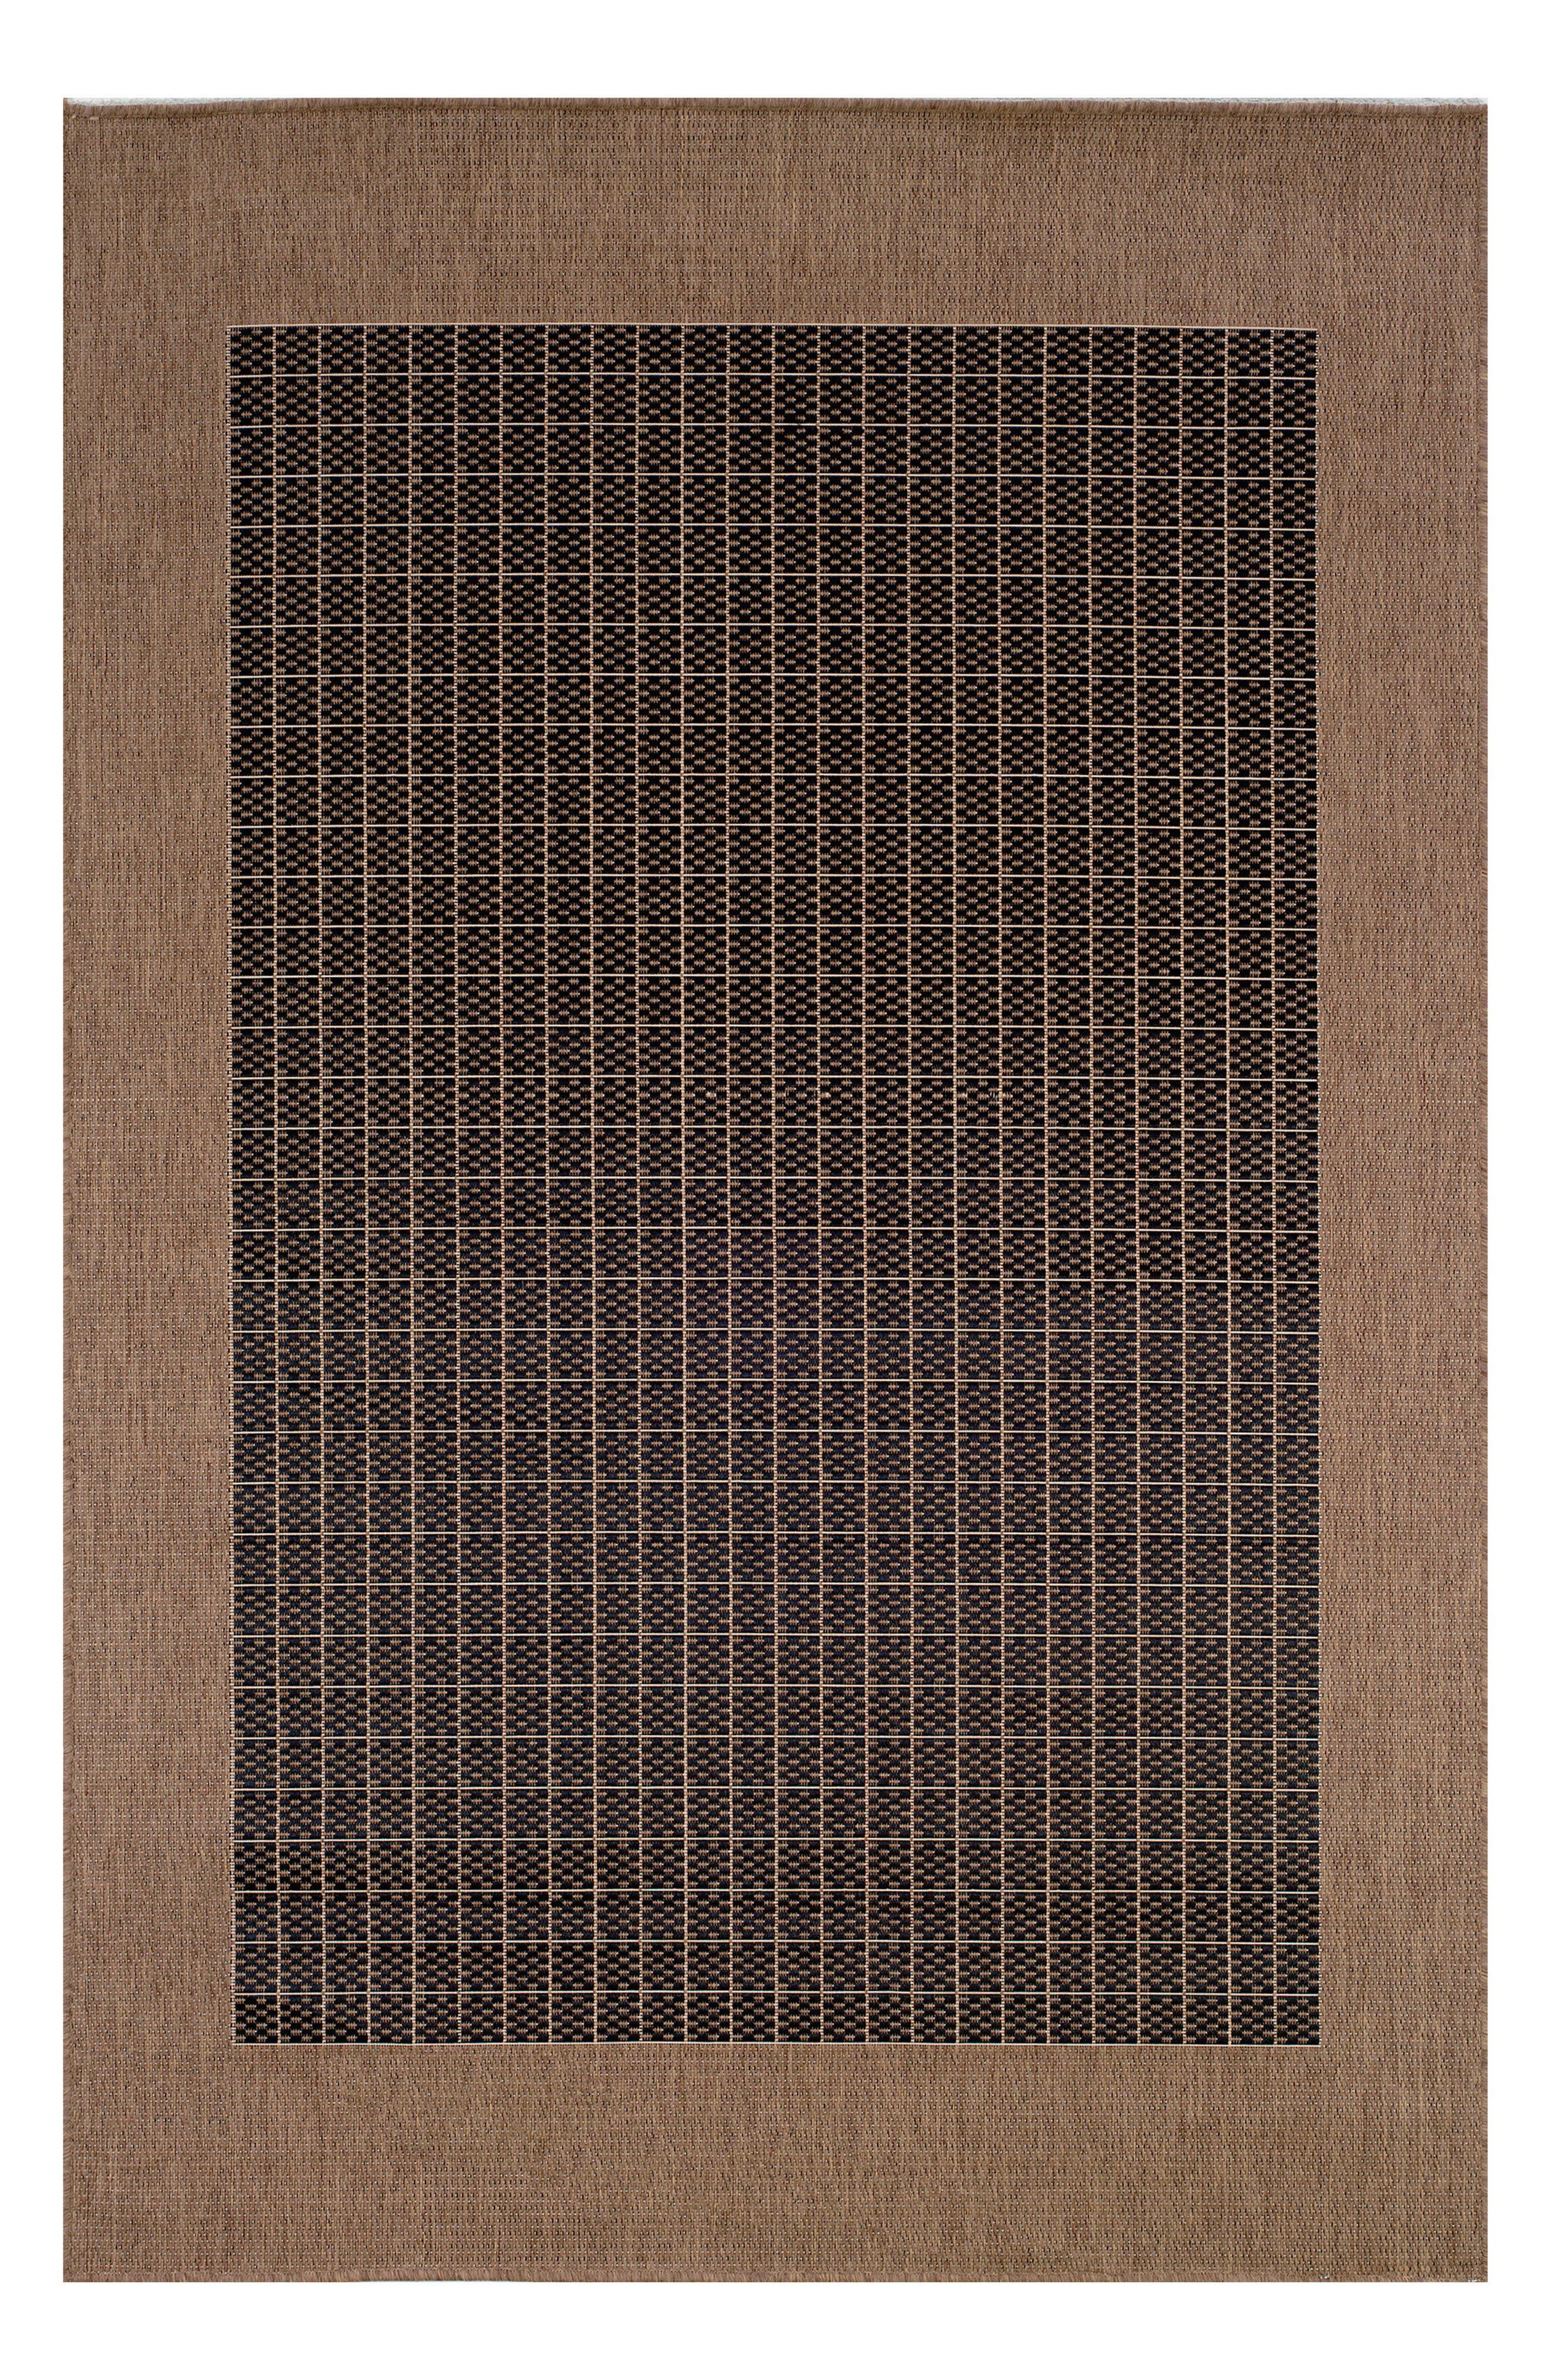 Checkered Field Indoor/Outdoor Rug,                         Main,                         color, 001